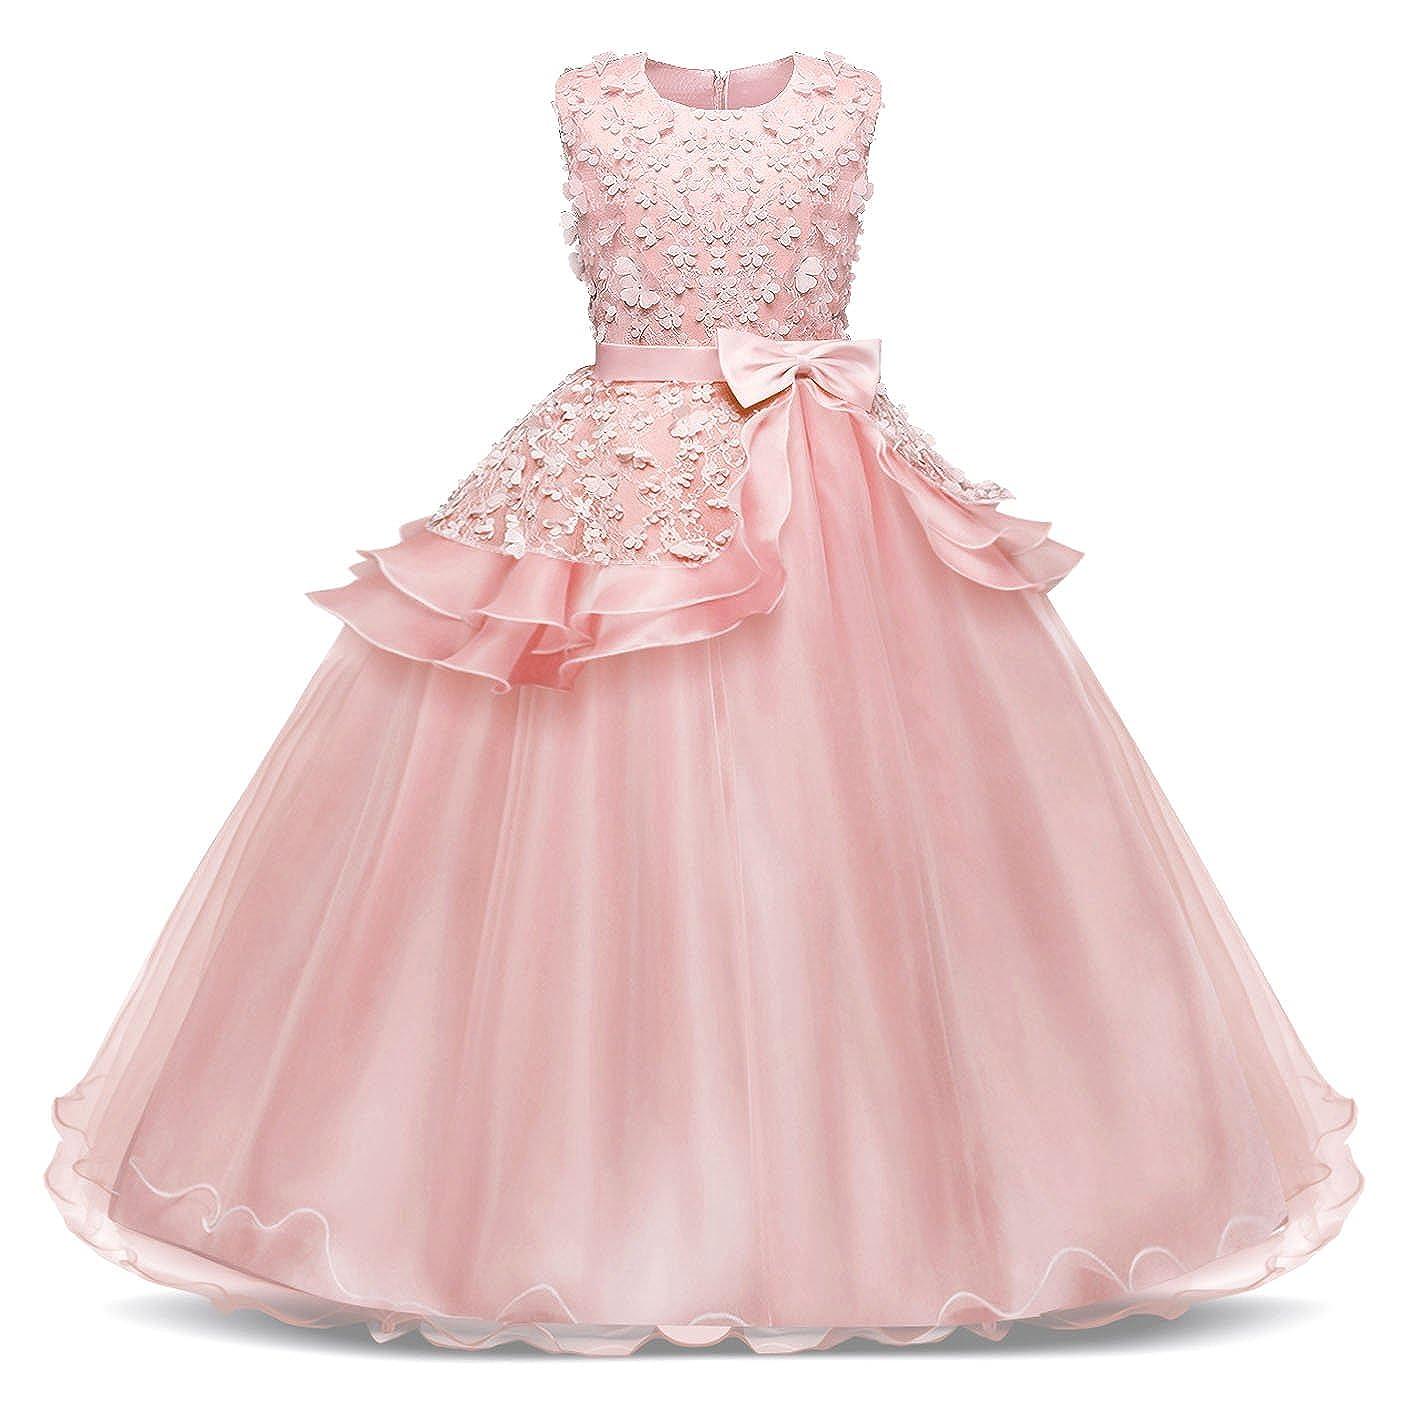 Bestfive Girls Floor Length Princess Dresses Kids Sleeveless Wedding Party Prom Ball Gowns Dress 4-14 Years